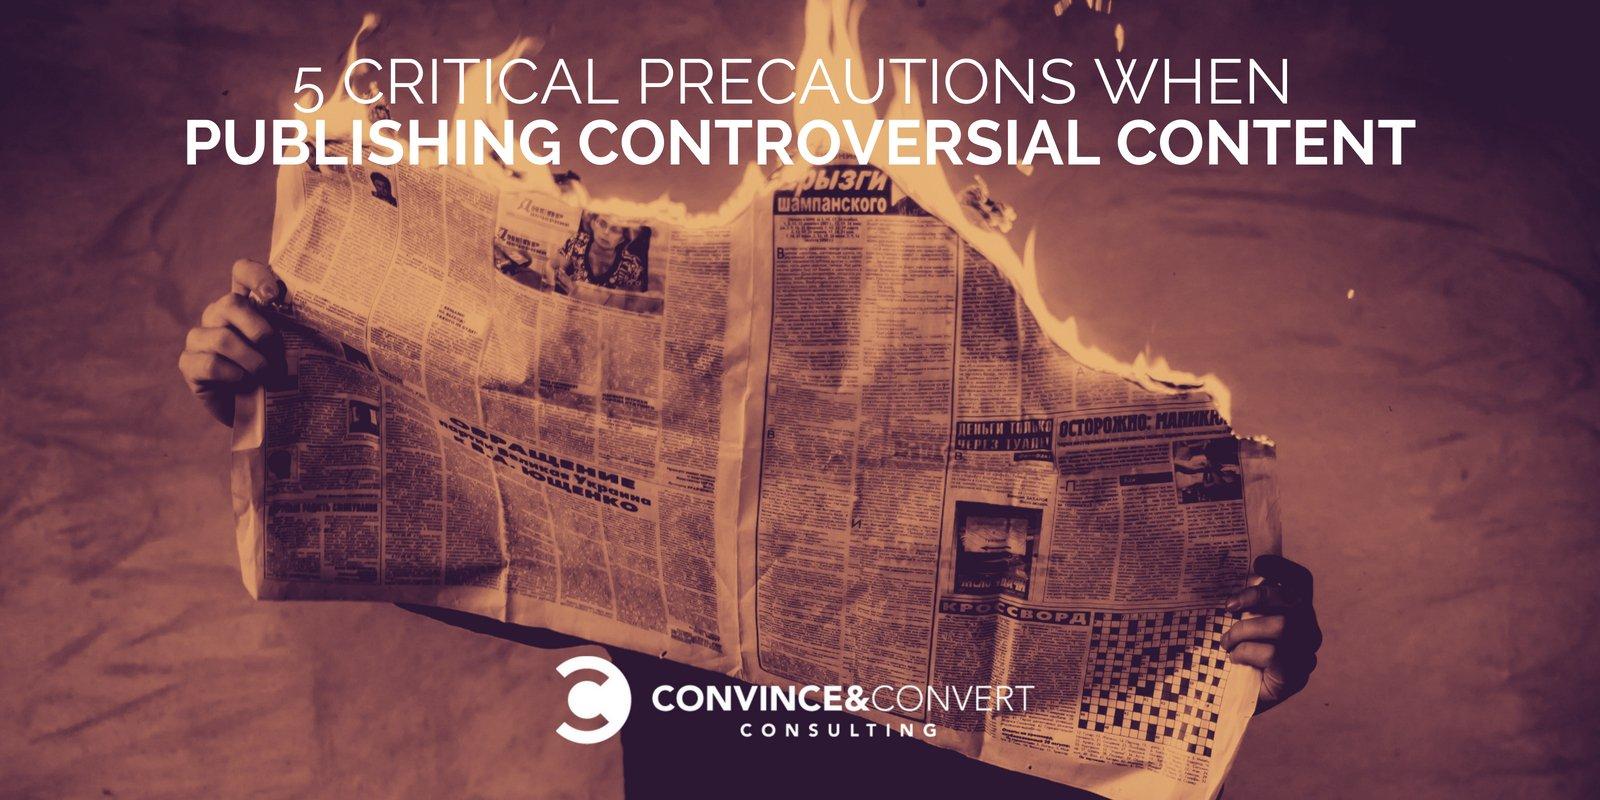 5 Critical Precautions When Publishing Controversial Content